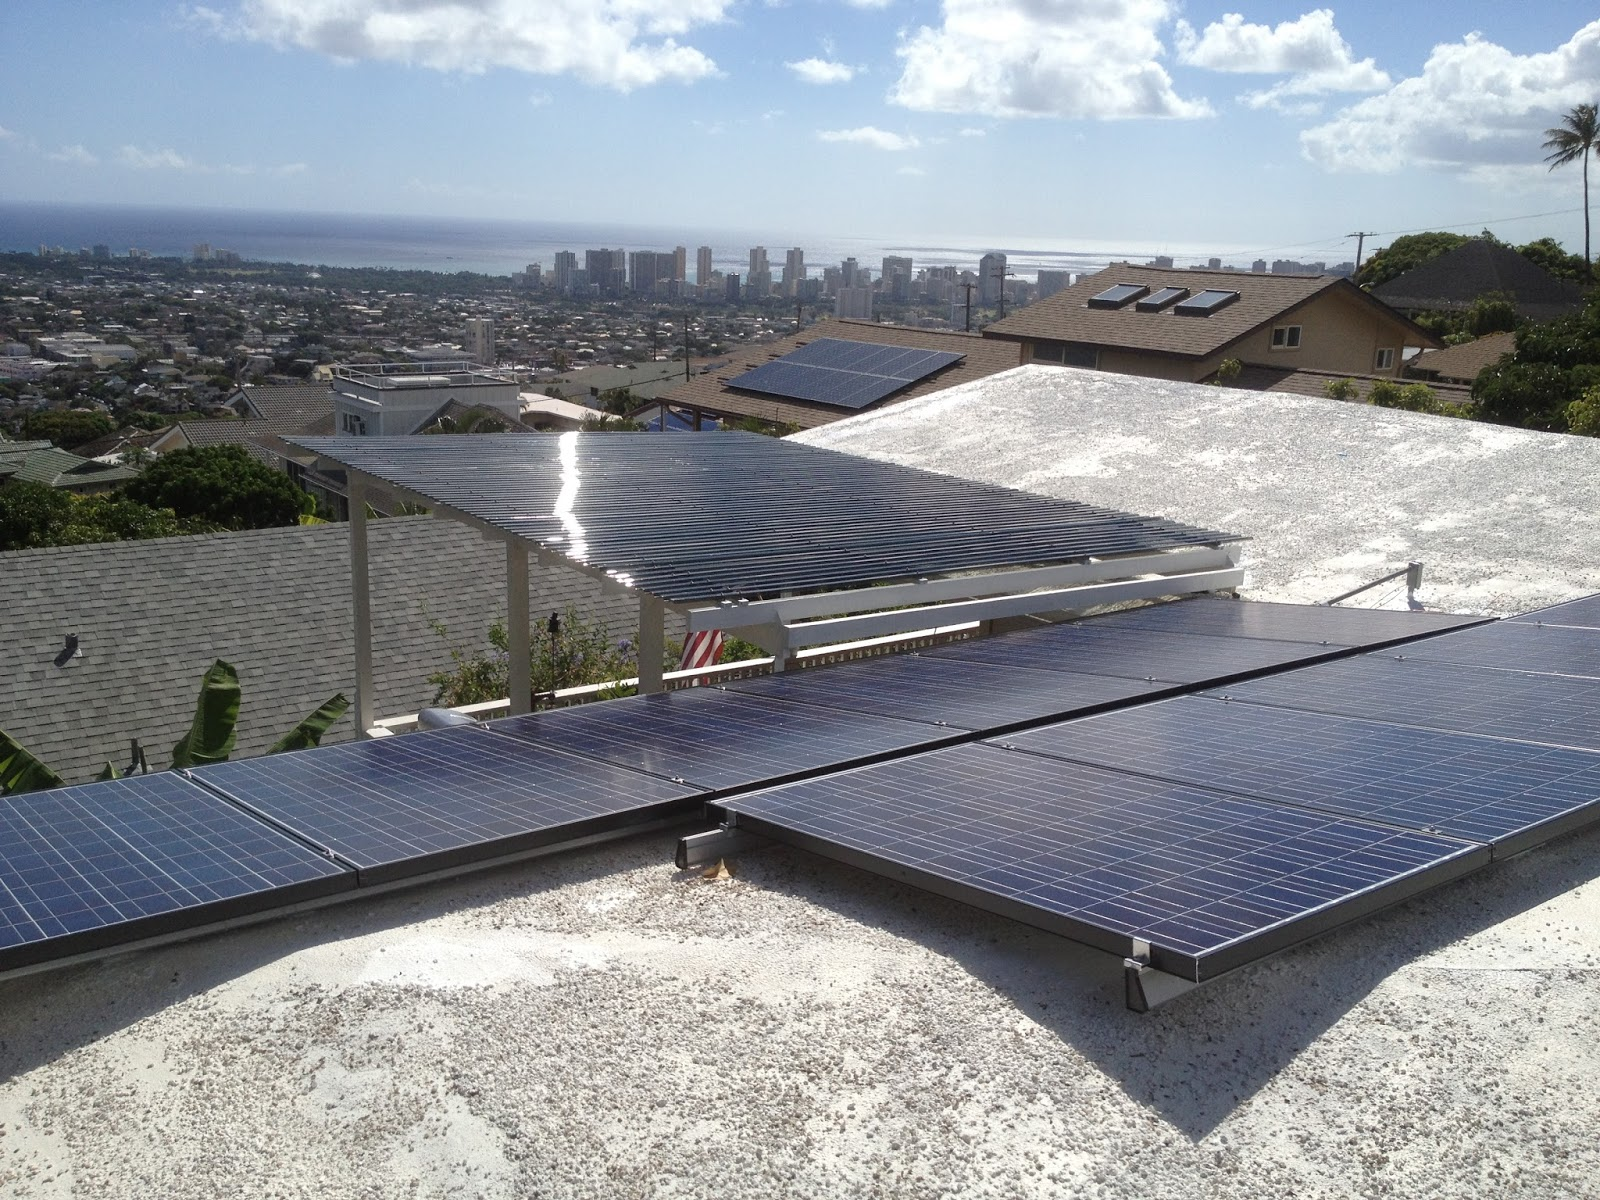 solar parts for sale